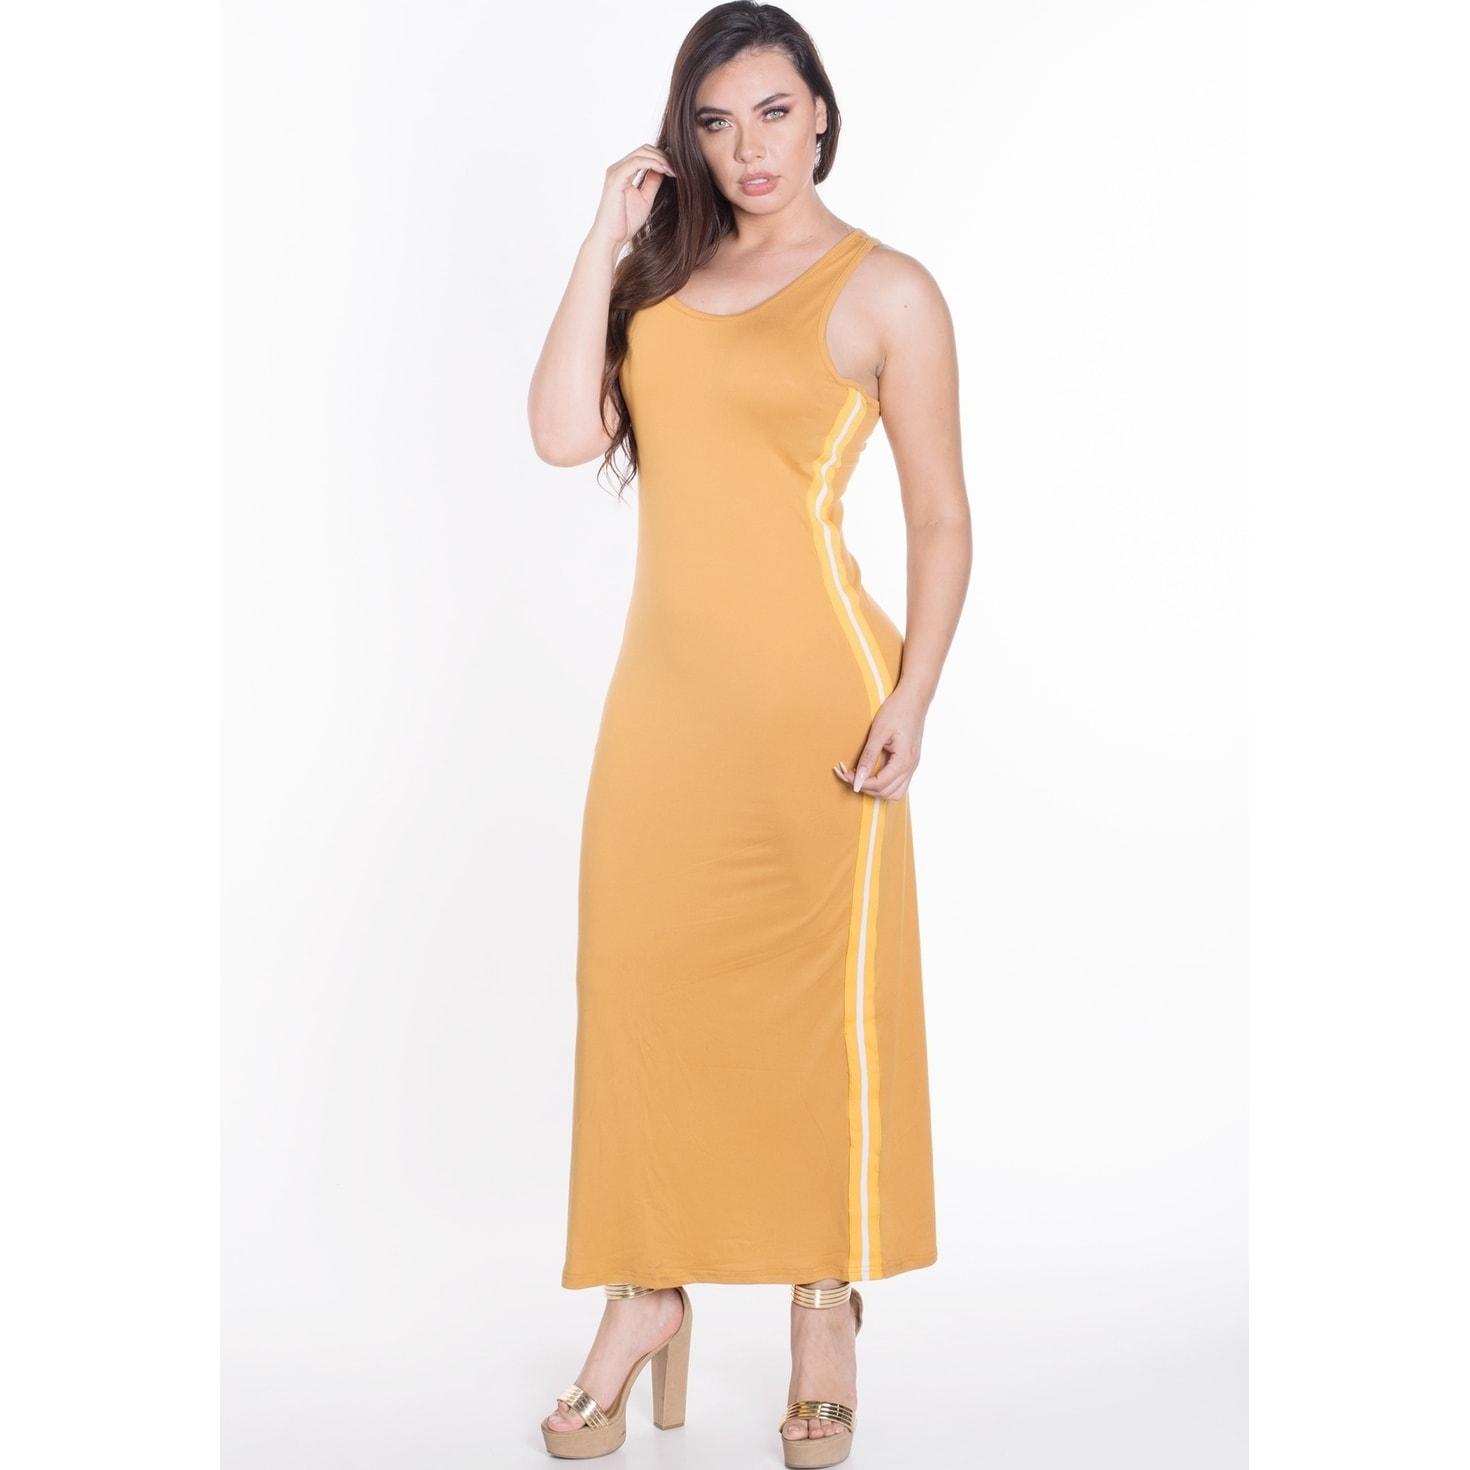 Women\'s Plus Size Sleeveless Bodycon Maxi Dress with Contrasting Yellow  Side Stripes